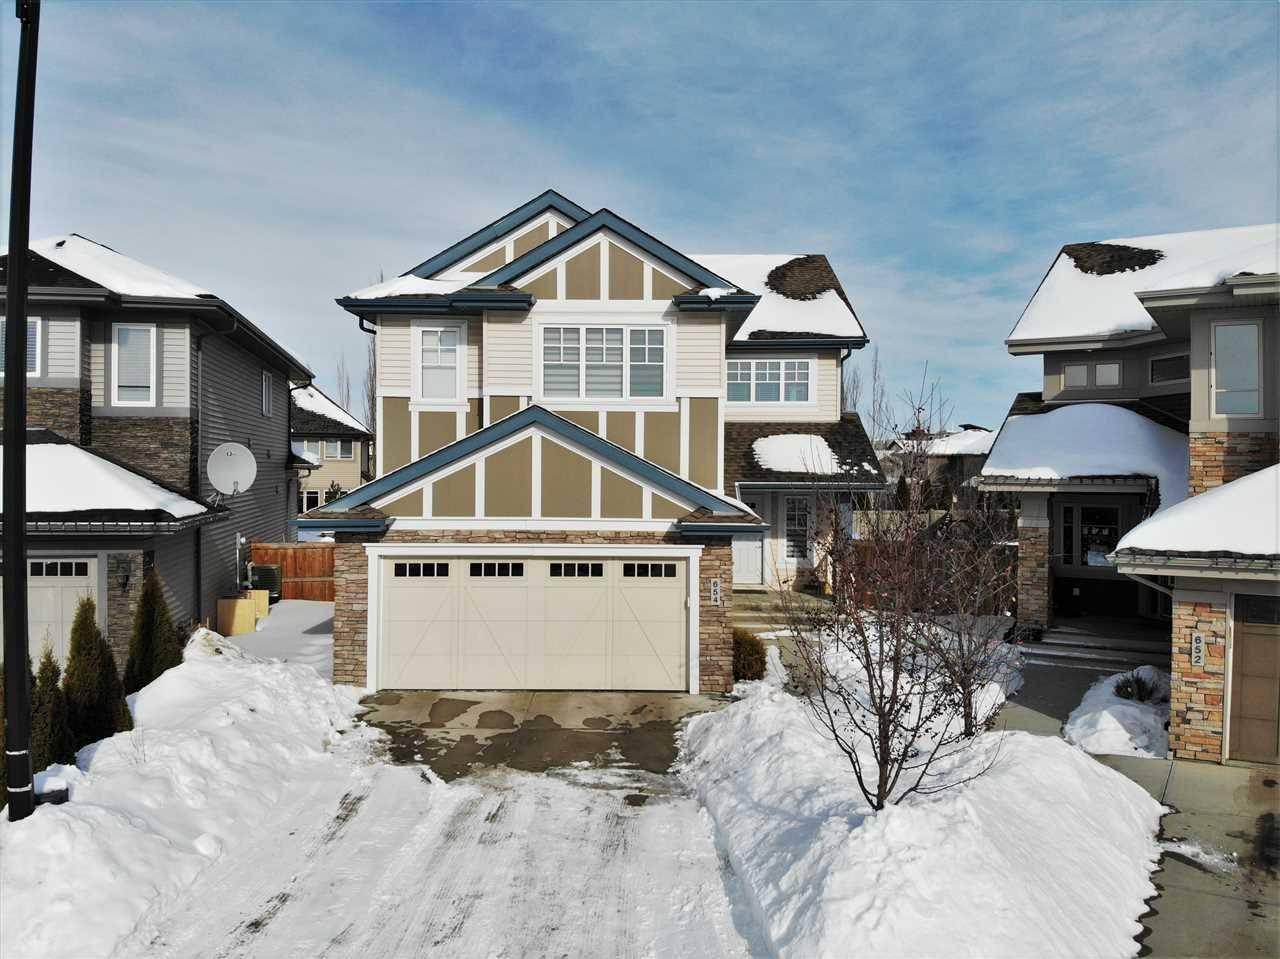 House for sale at 654 Adams Wy Sw Edmonton Alberta - MLS: E4188162